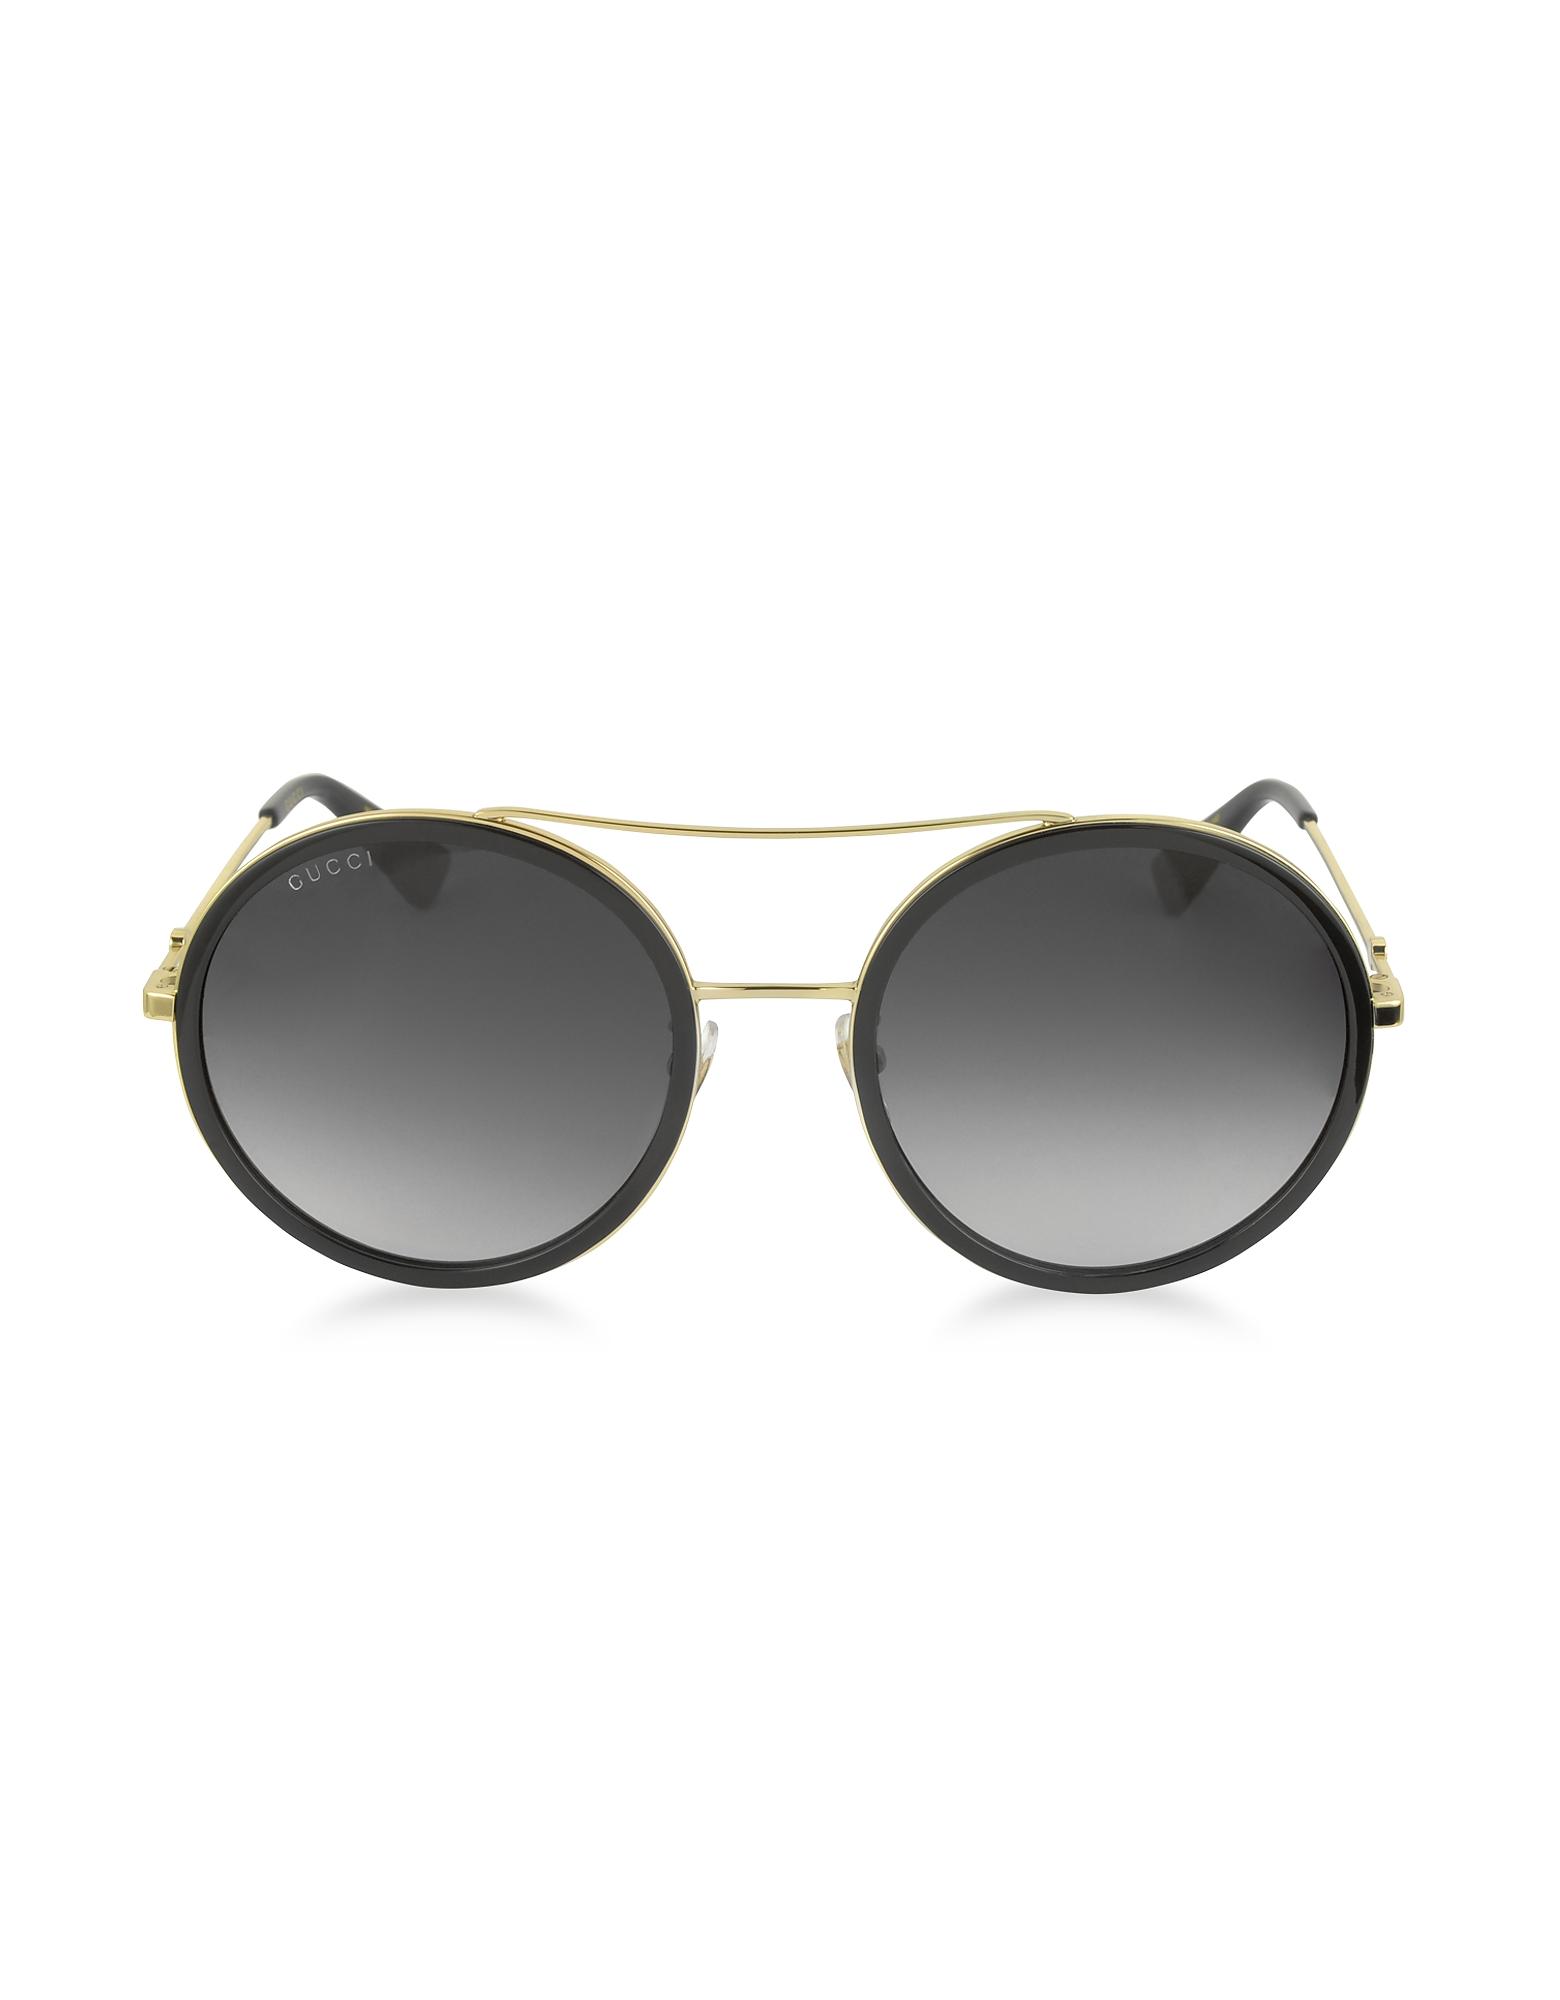 Gucci Designer Sunglasses, GG0061S Acetate and Gold Metal Round Aviator Women's Sunglasses